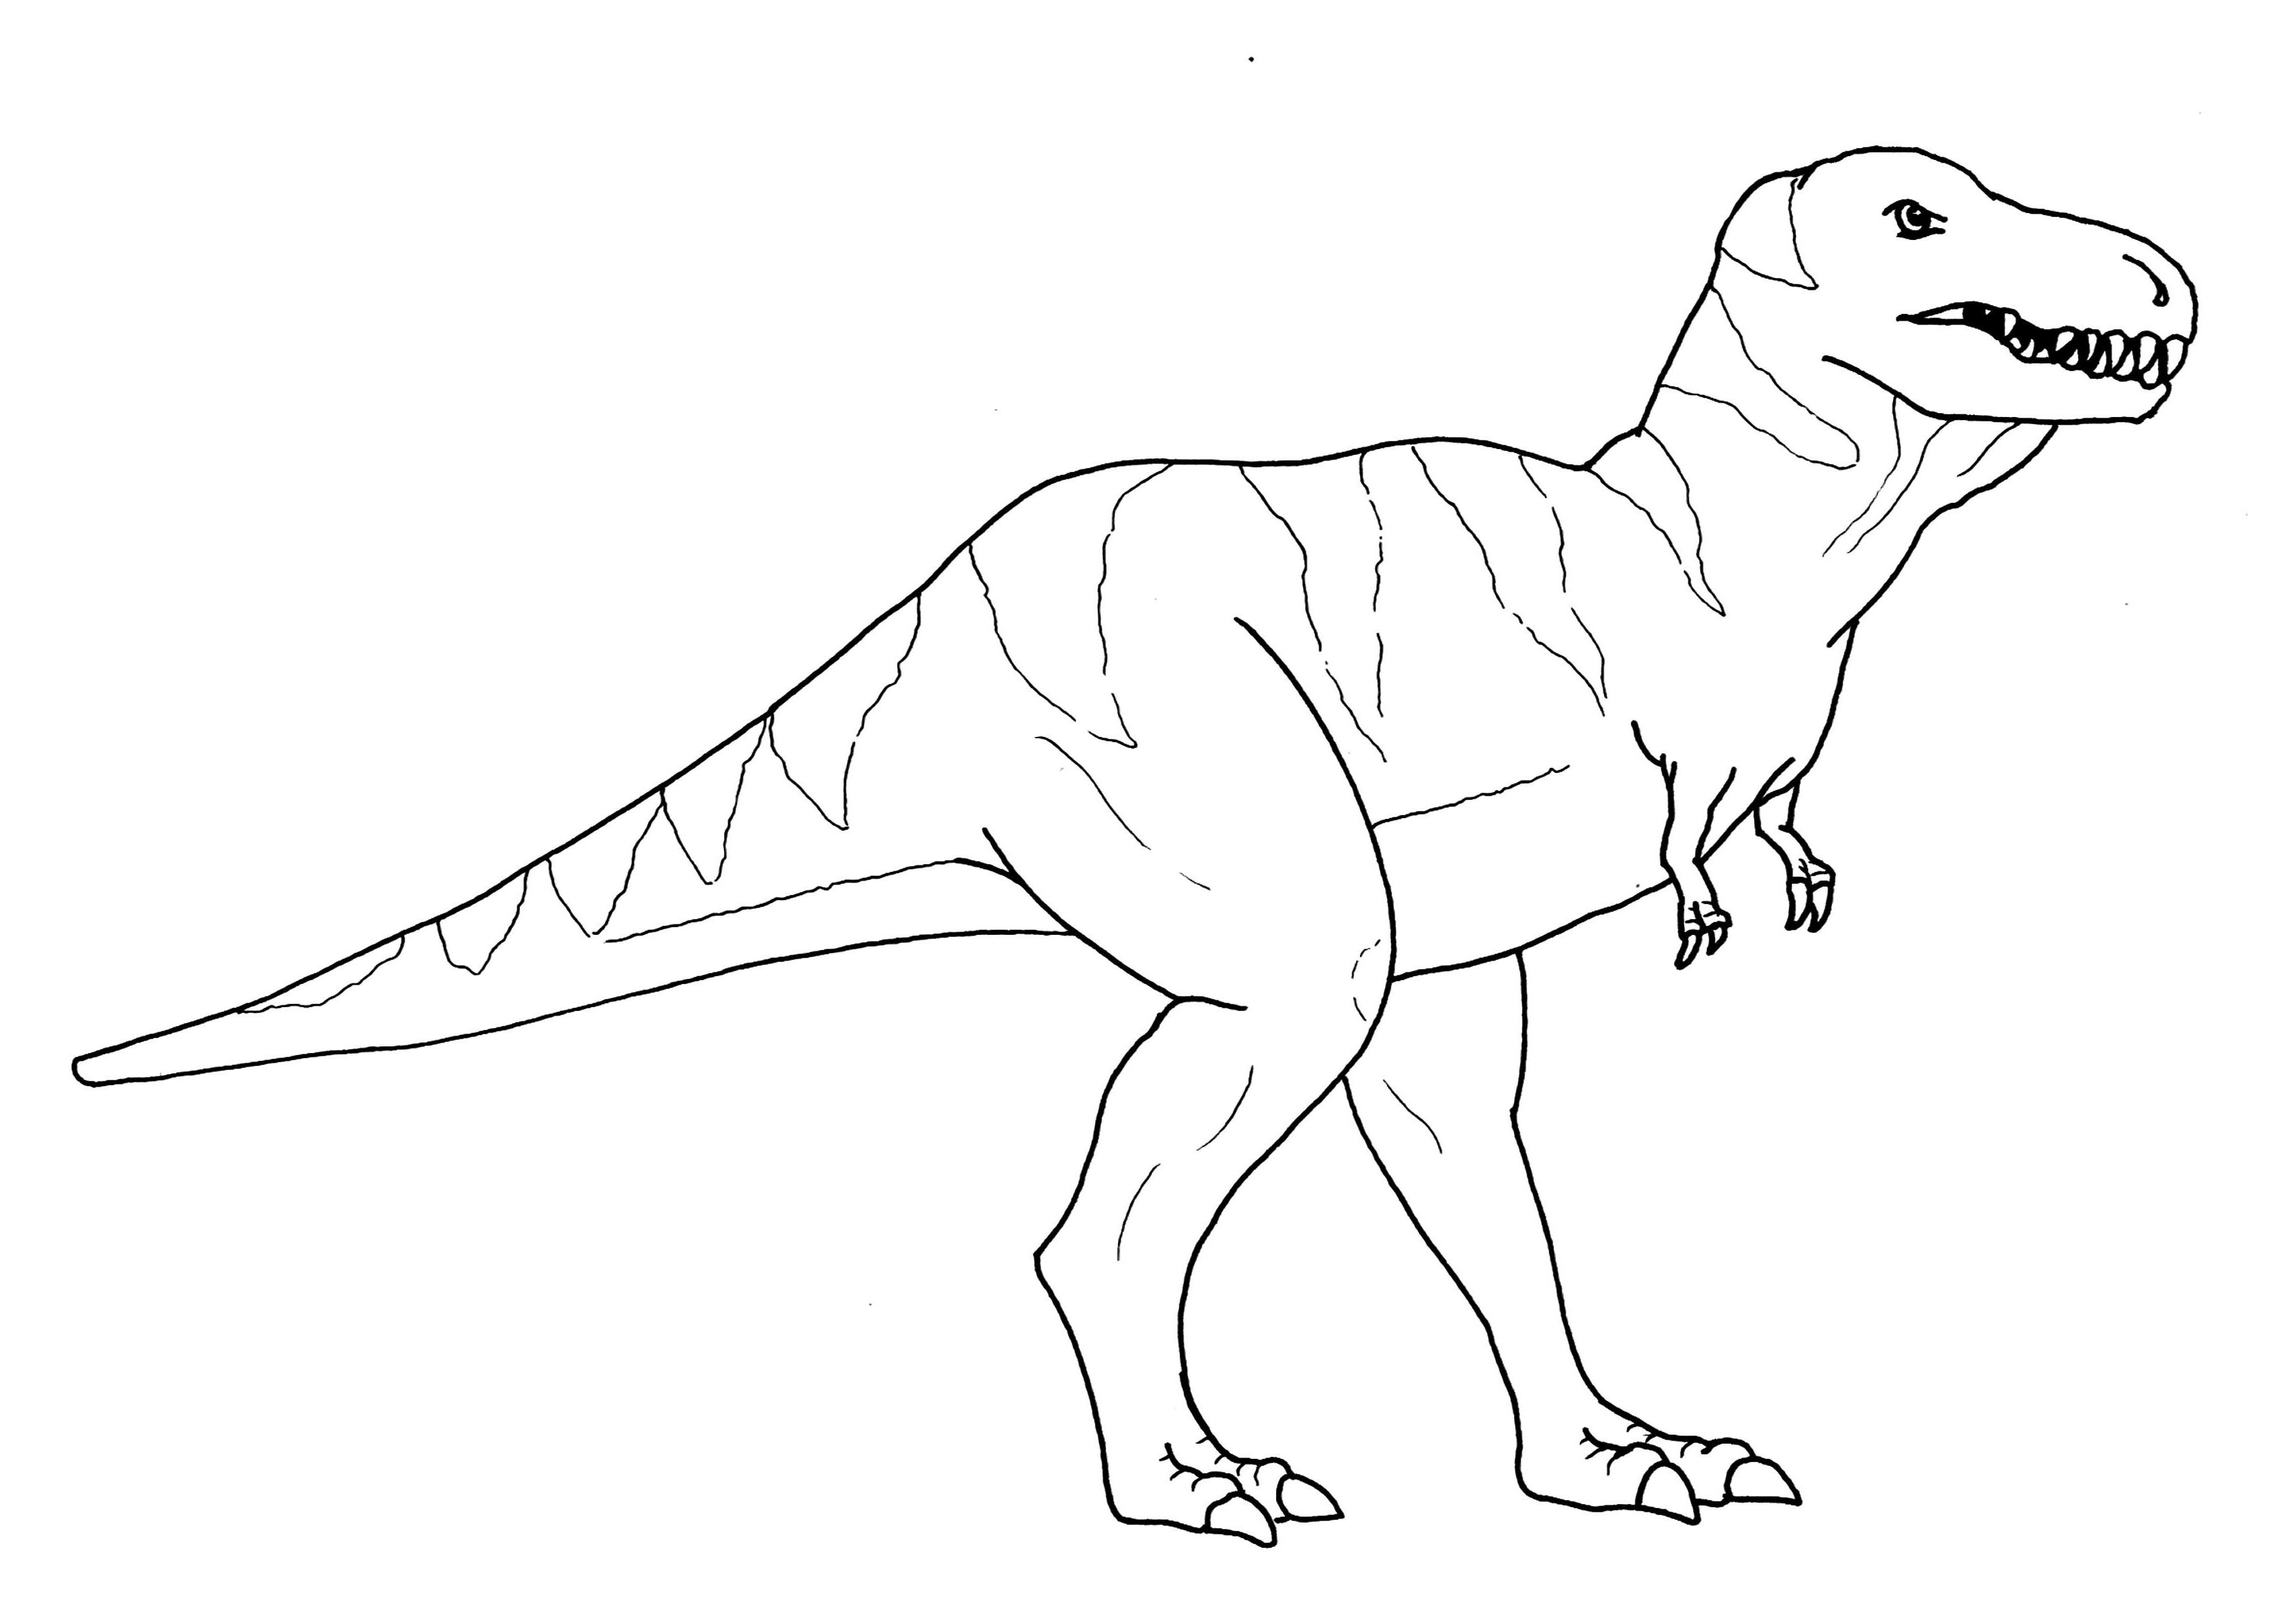 tyrannosaurus rex coloring page 4